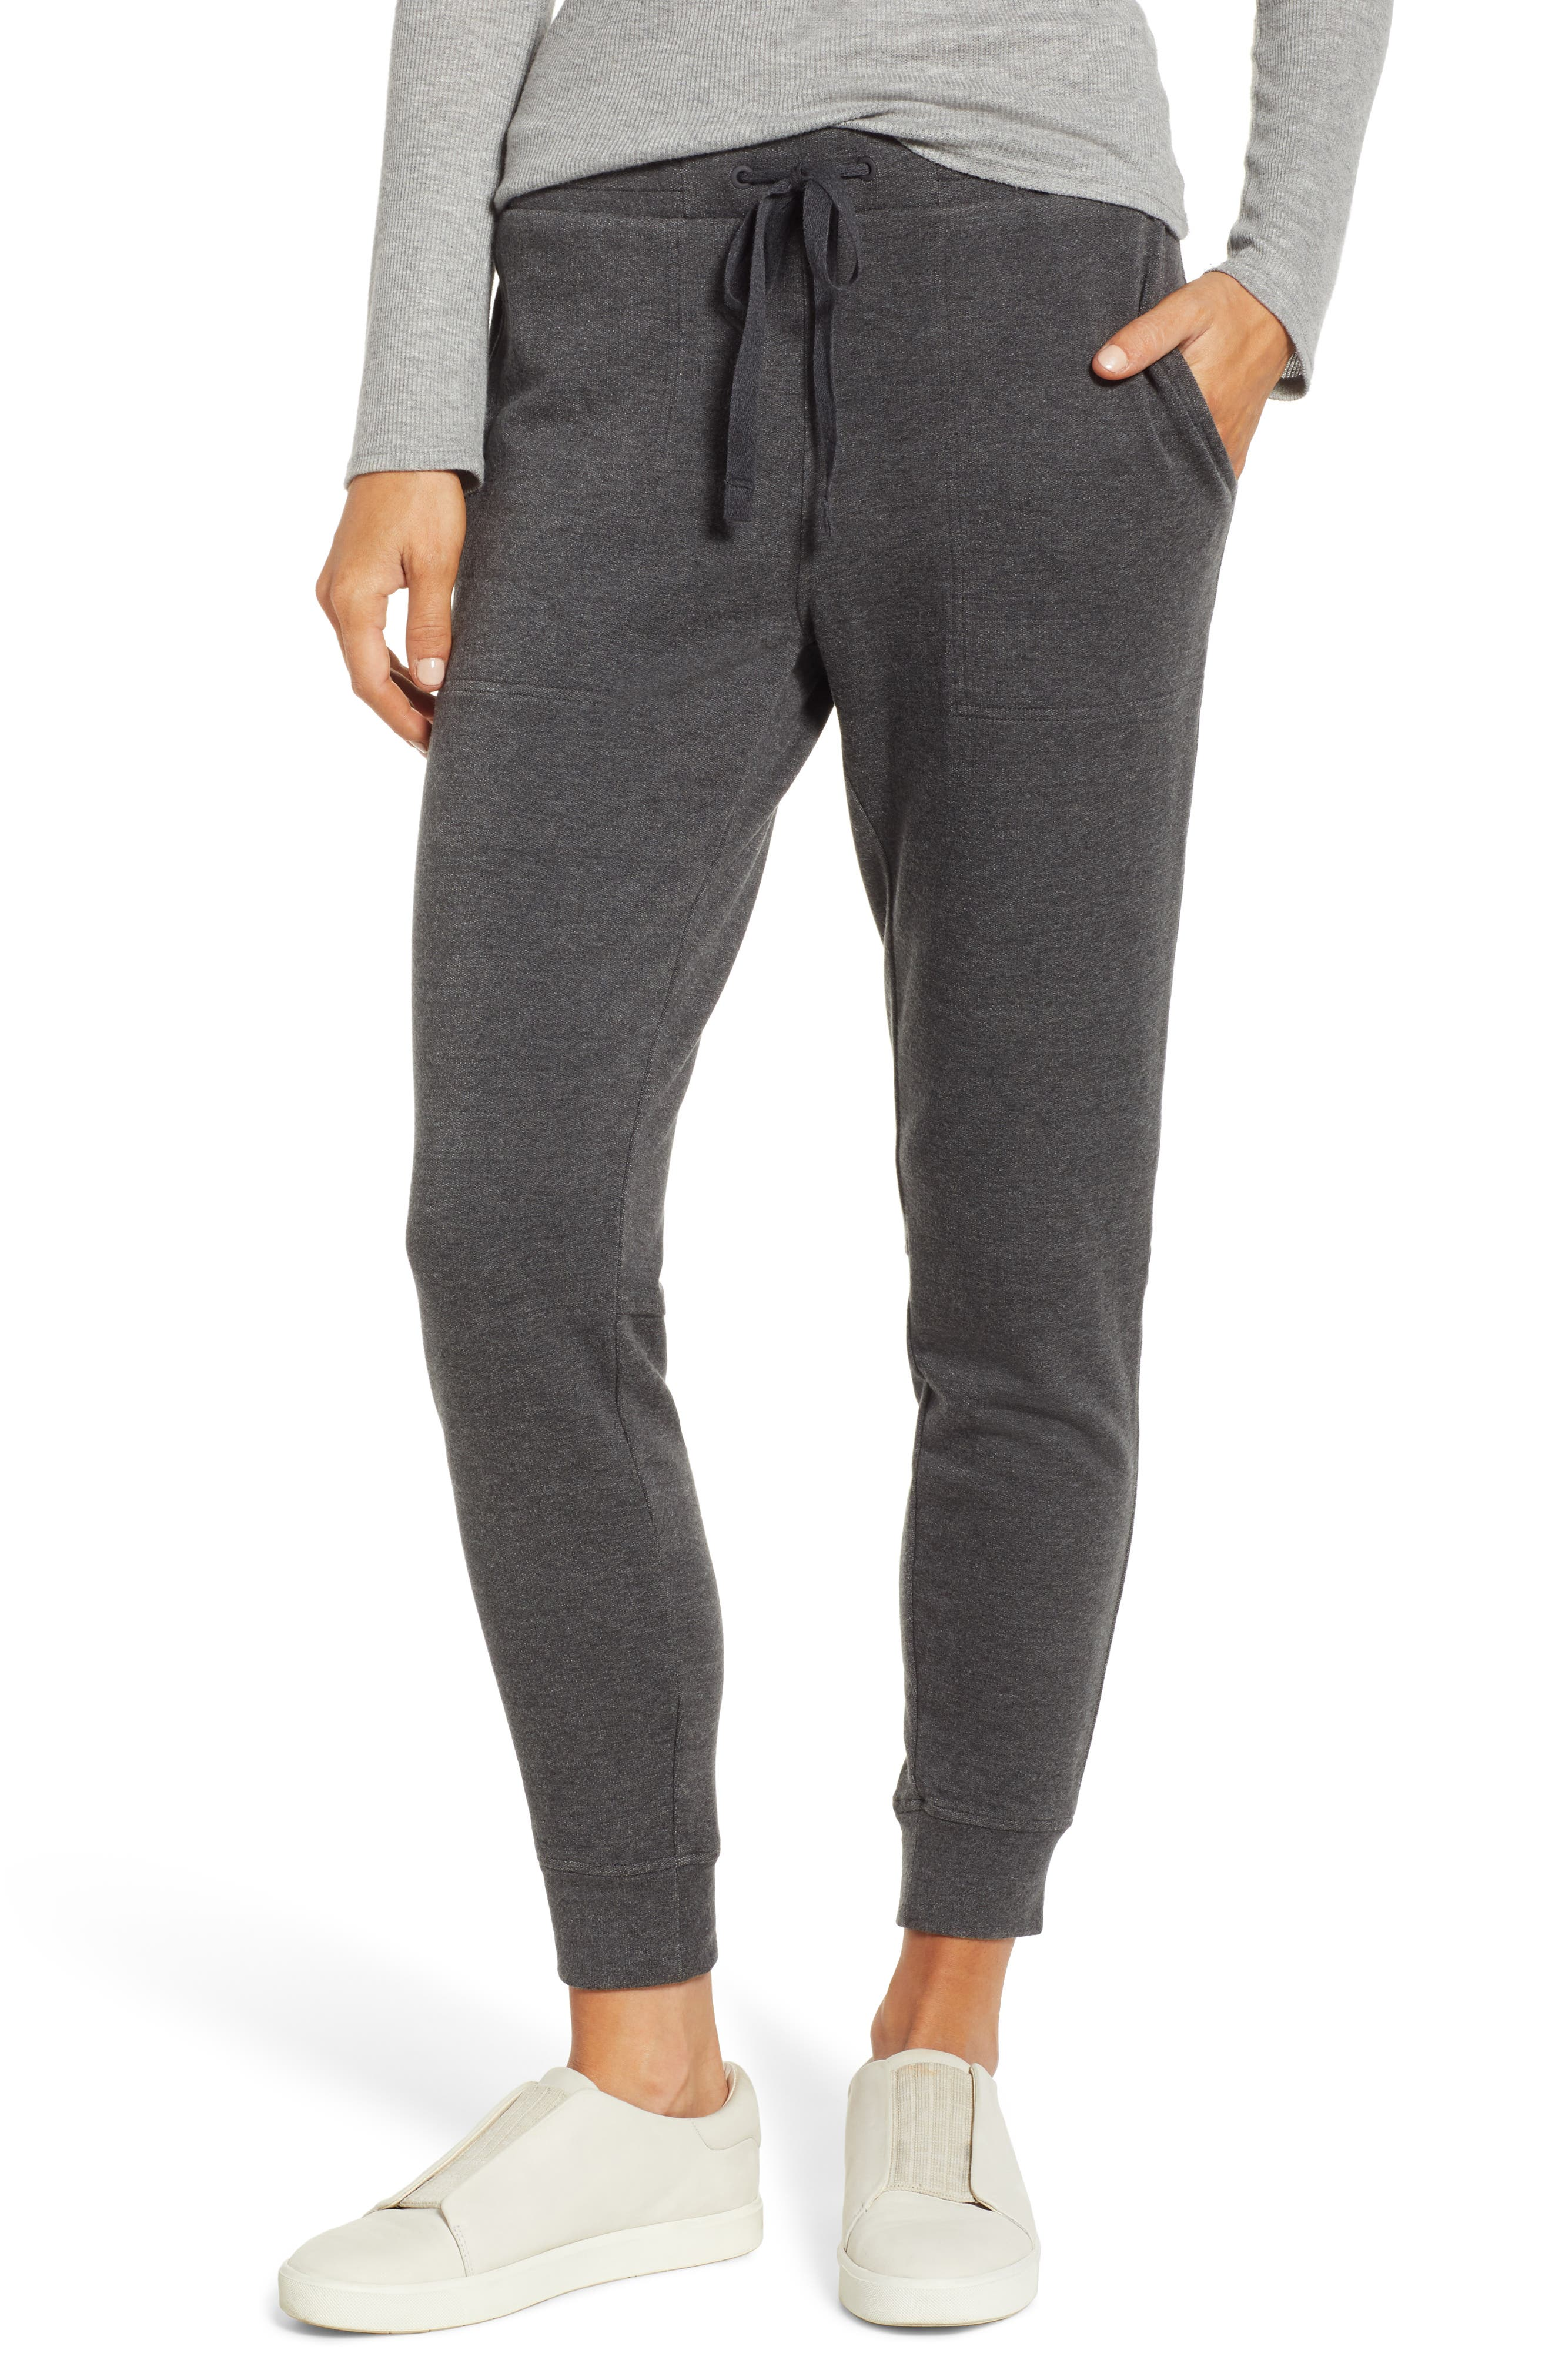 Zen Bounce Upstate Sweatpants,                             Main thumbnail 1, color,                             CHARCOAL